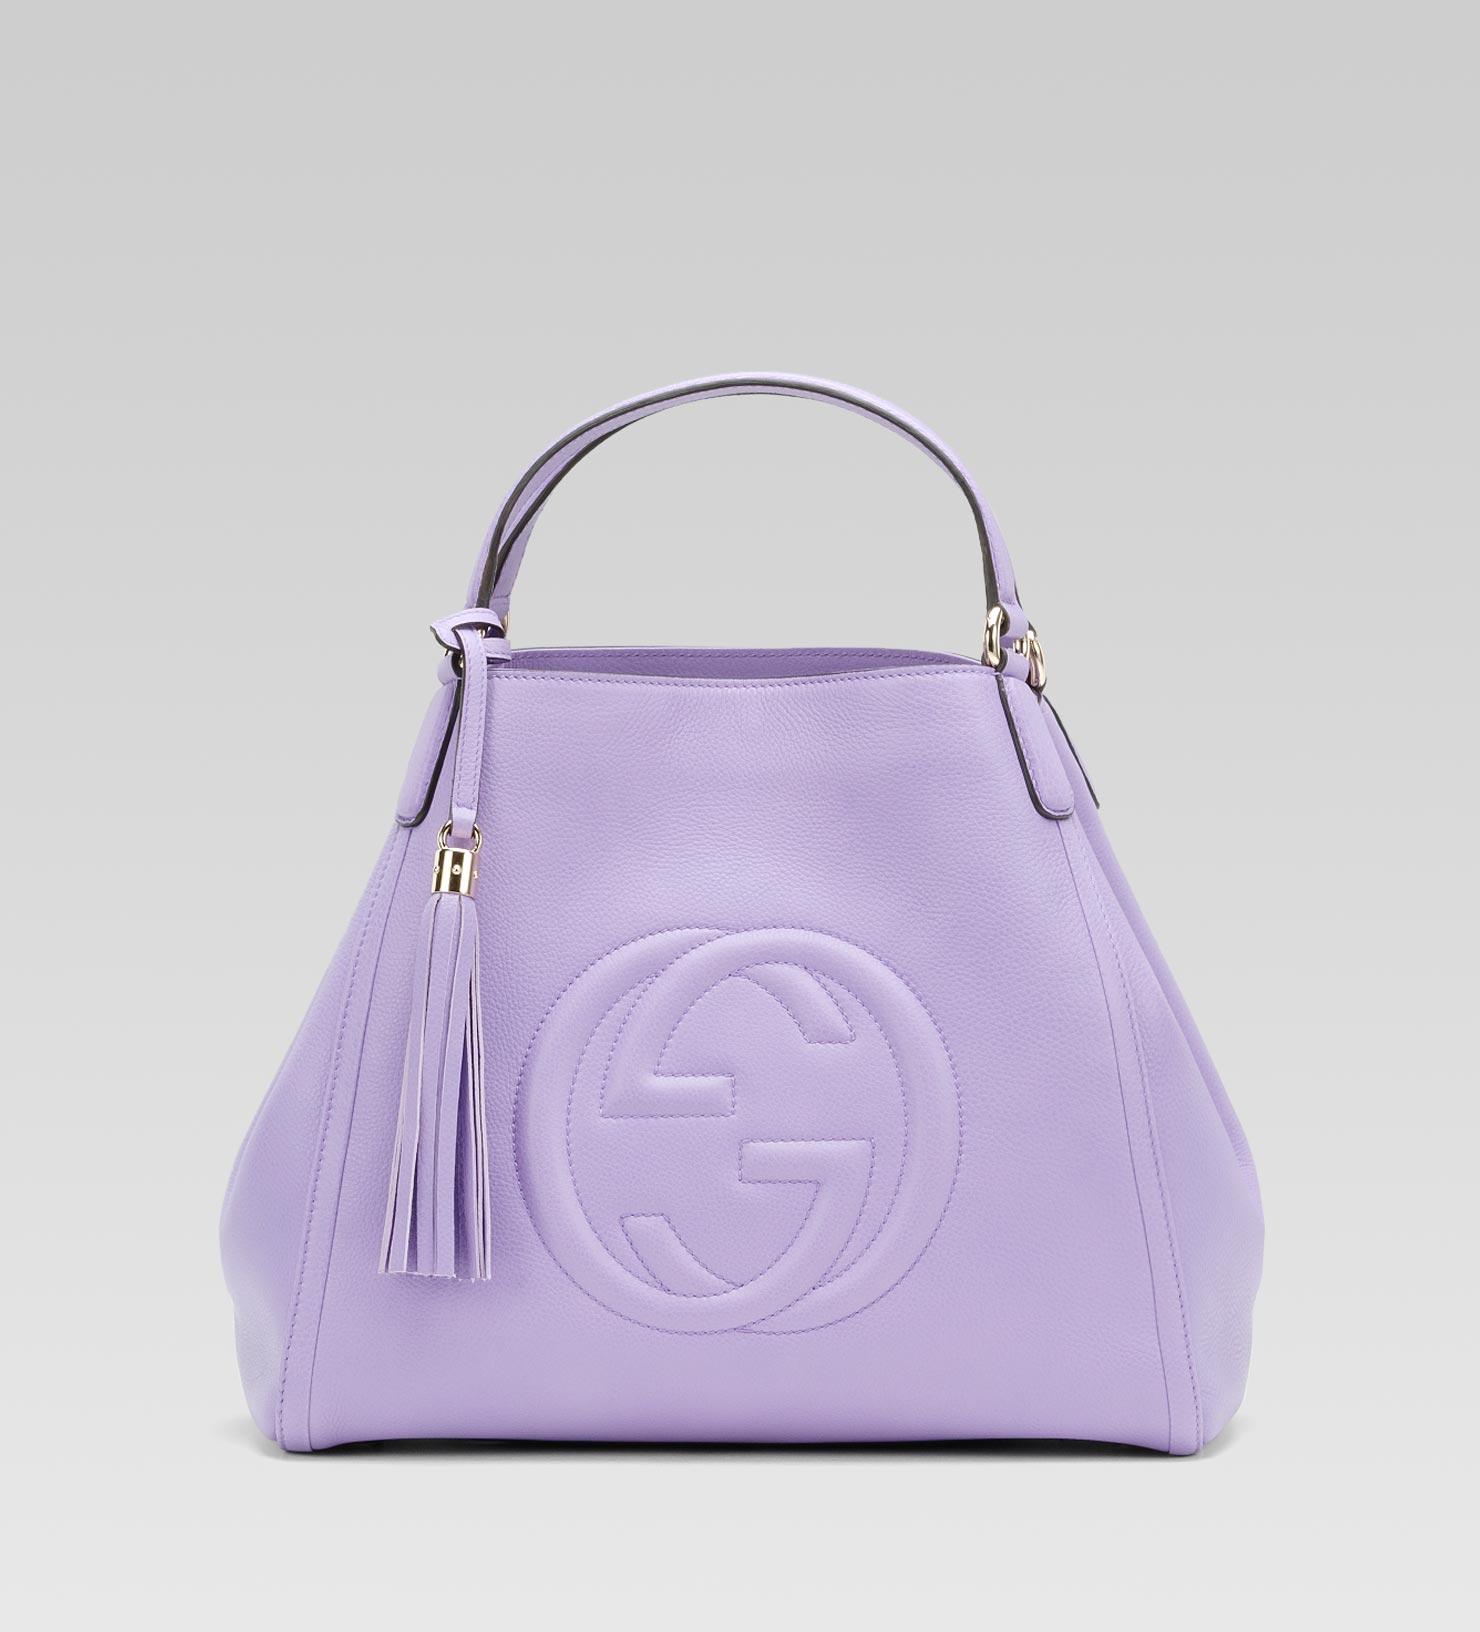 Lyst - Gucci Soho Shoulder Bag in Purple 3f195d1aca0f5